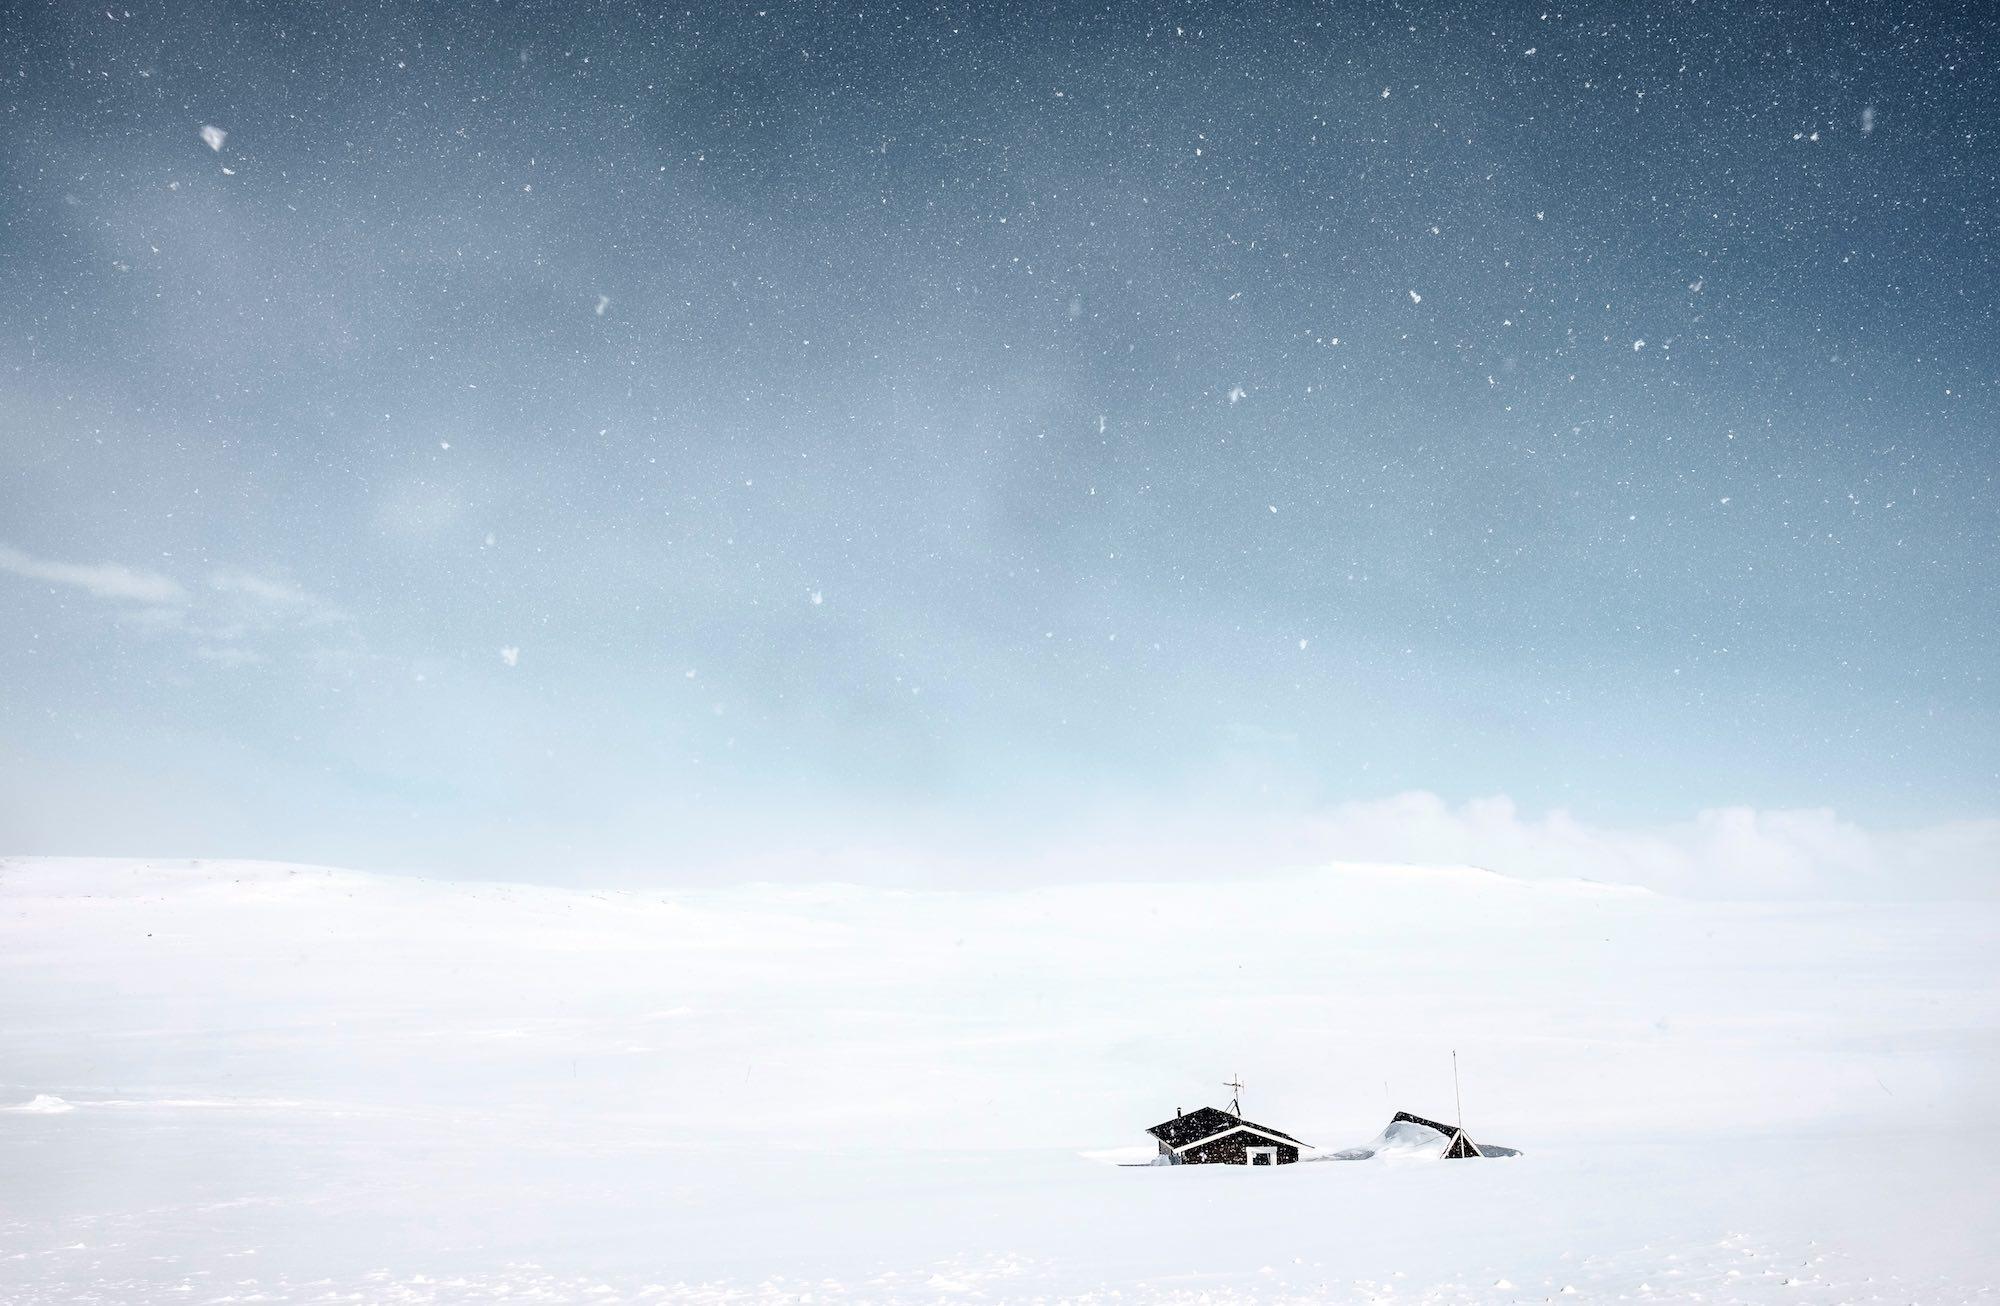 Winter Mountain Huts in Norway, Scandinavia